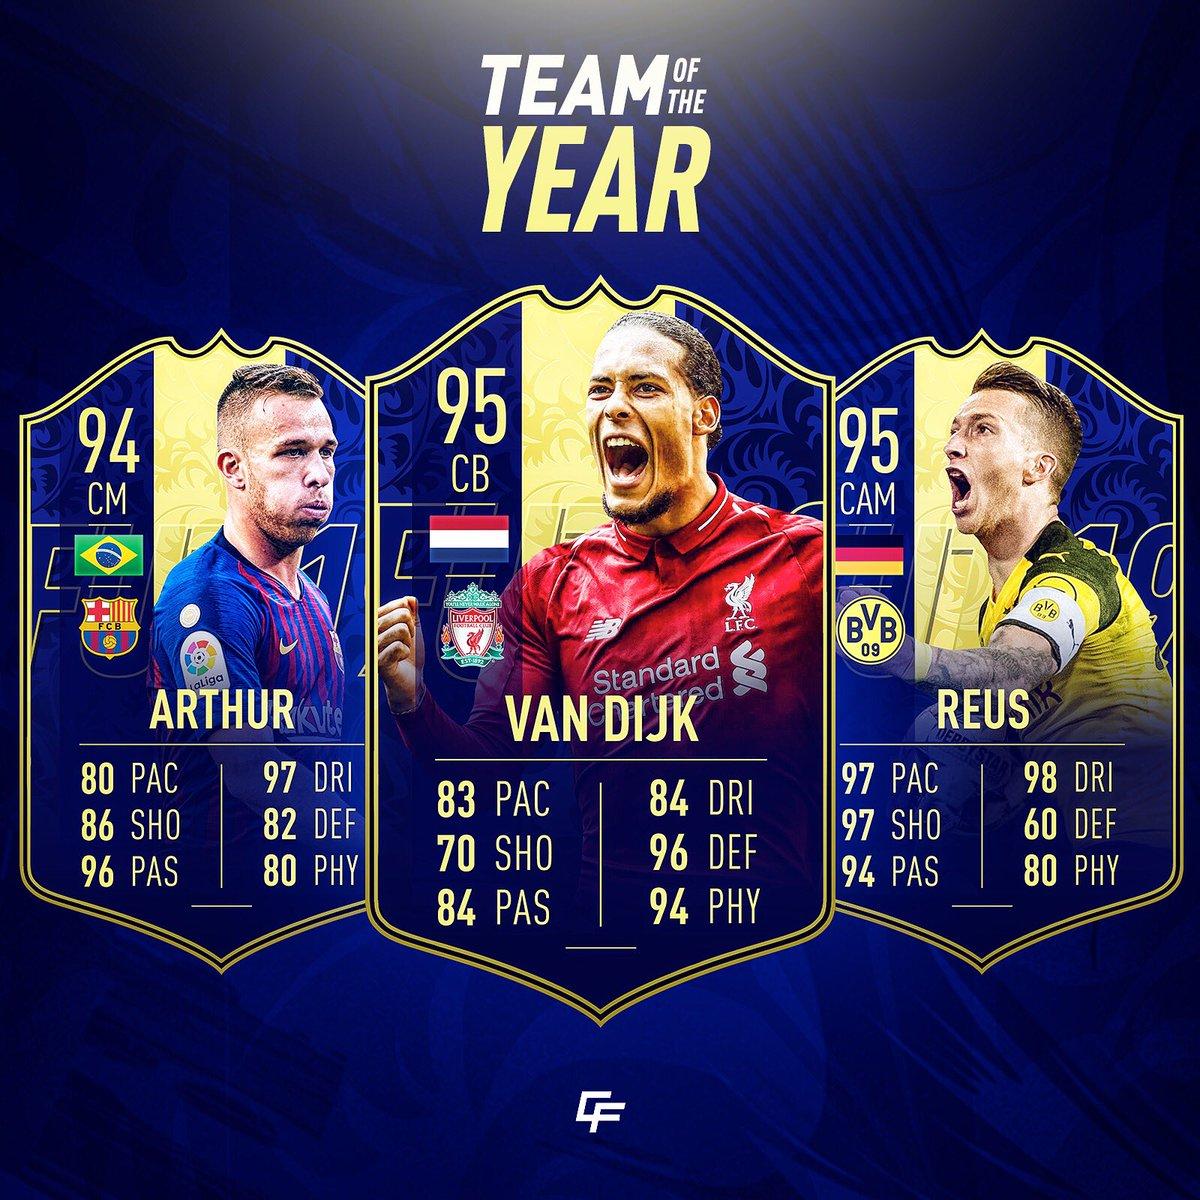 c66b14e26 Sahil Soon   FUT  FIFA19 TOTY pic.twitter.com fN1qbTIpyl